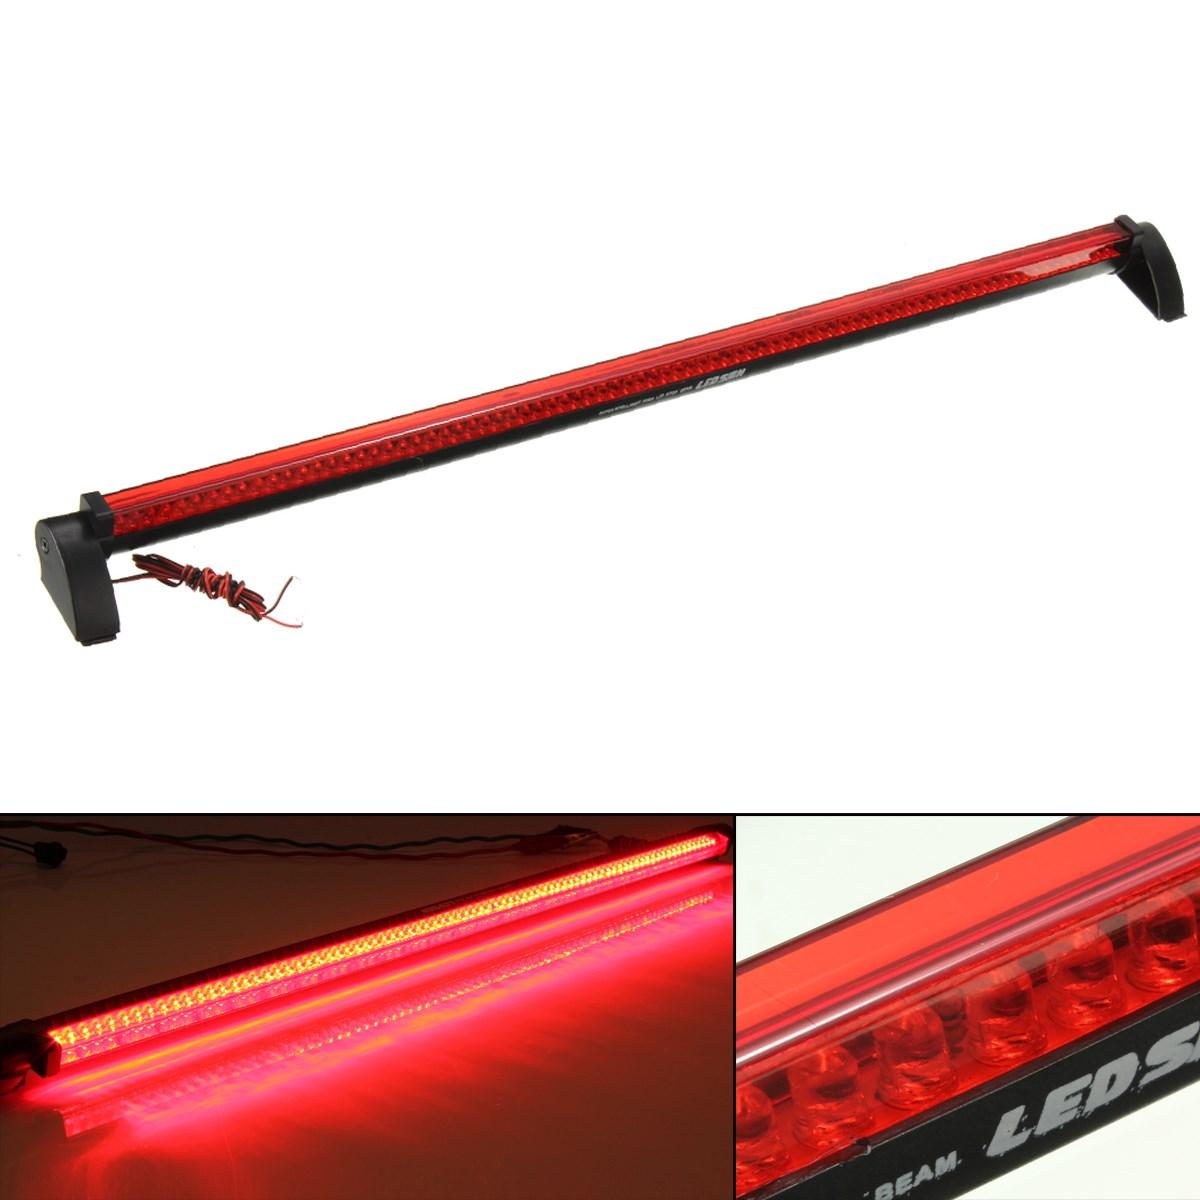 Universal Red 80 LED Car Third Brake Light Rear Tail Light High Mount Stop Lamp 12V(China (Mainland))